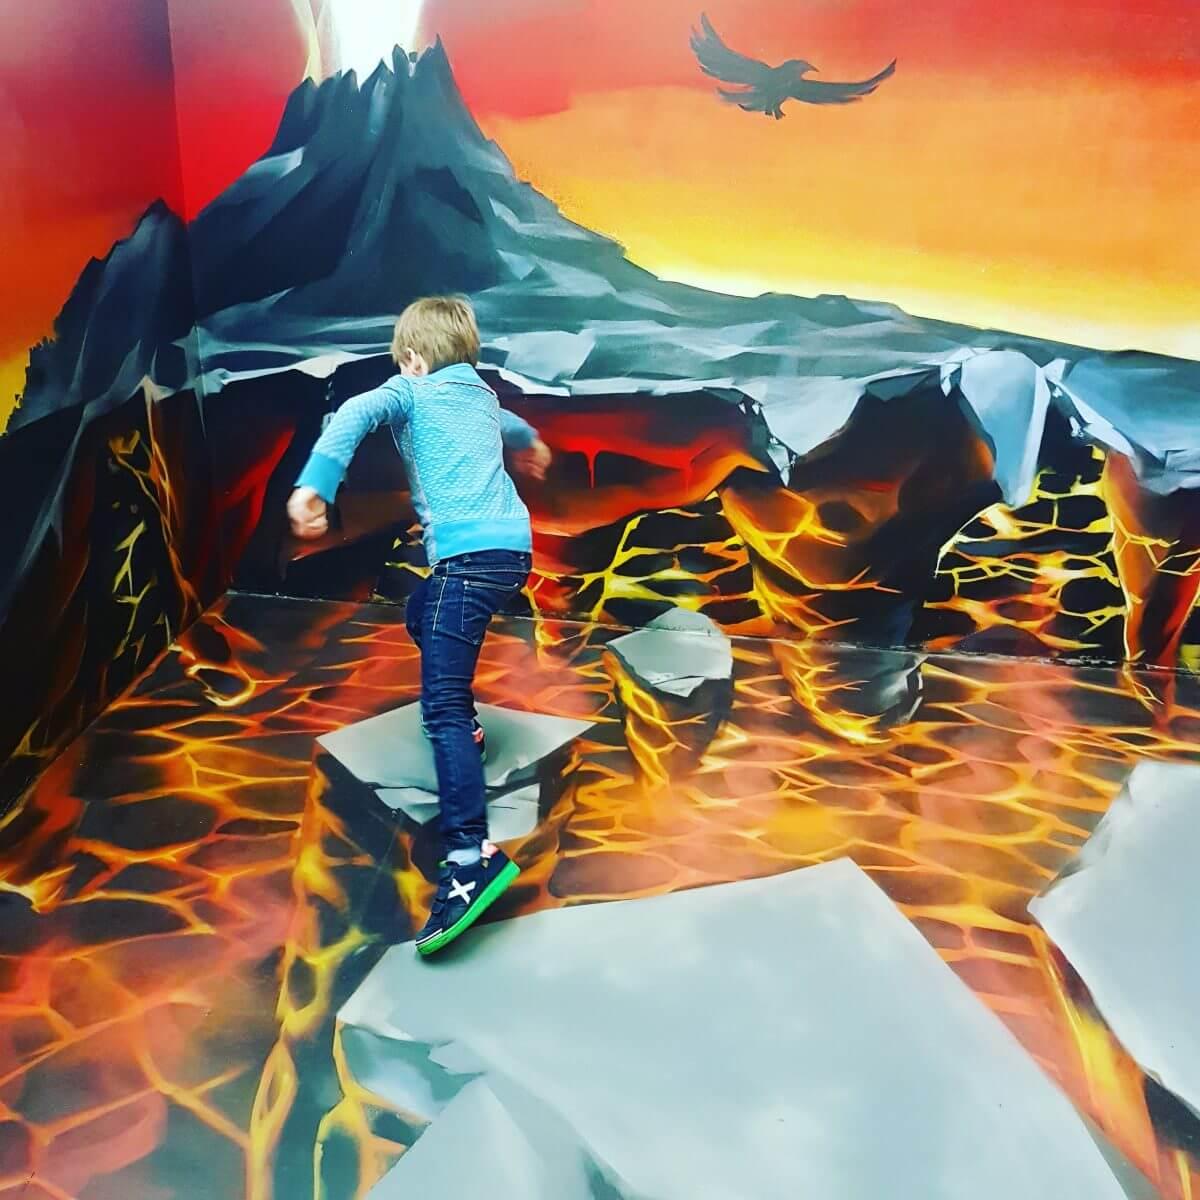 Uitbarstende vulkaan in Museum of Amsterdam Illusions